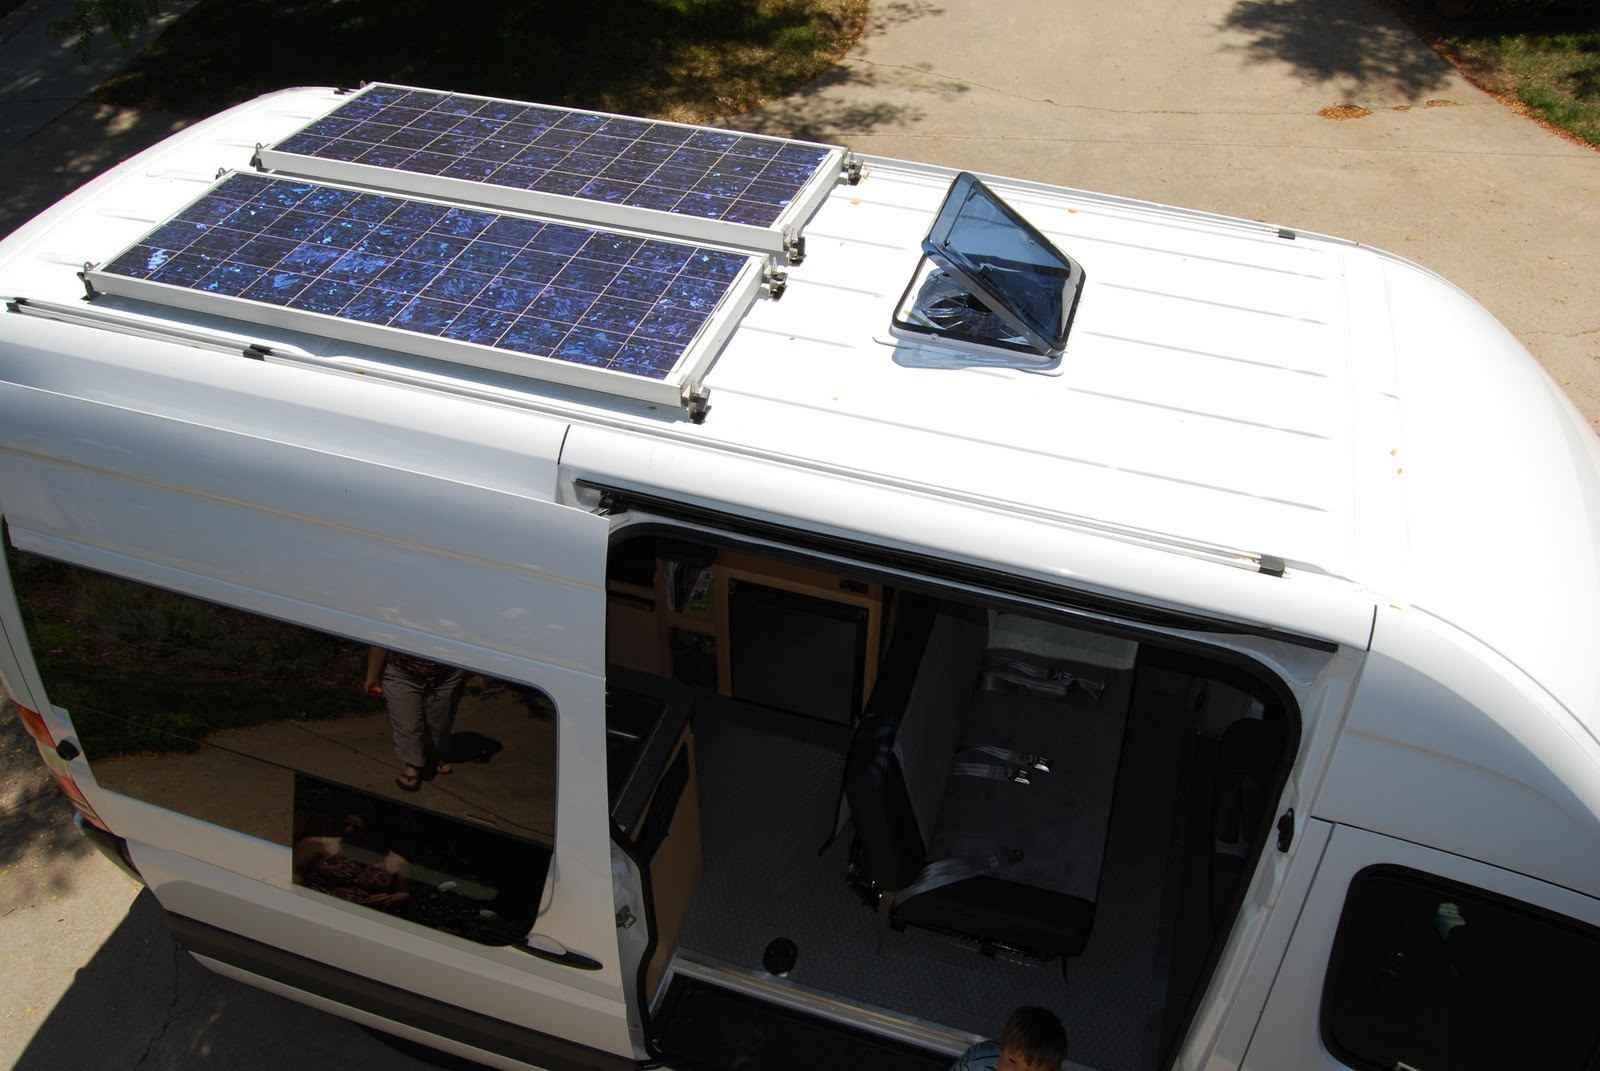 rv solar 8n ford tractor wiring diagram generator for reviewsolar